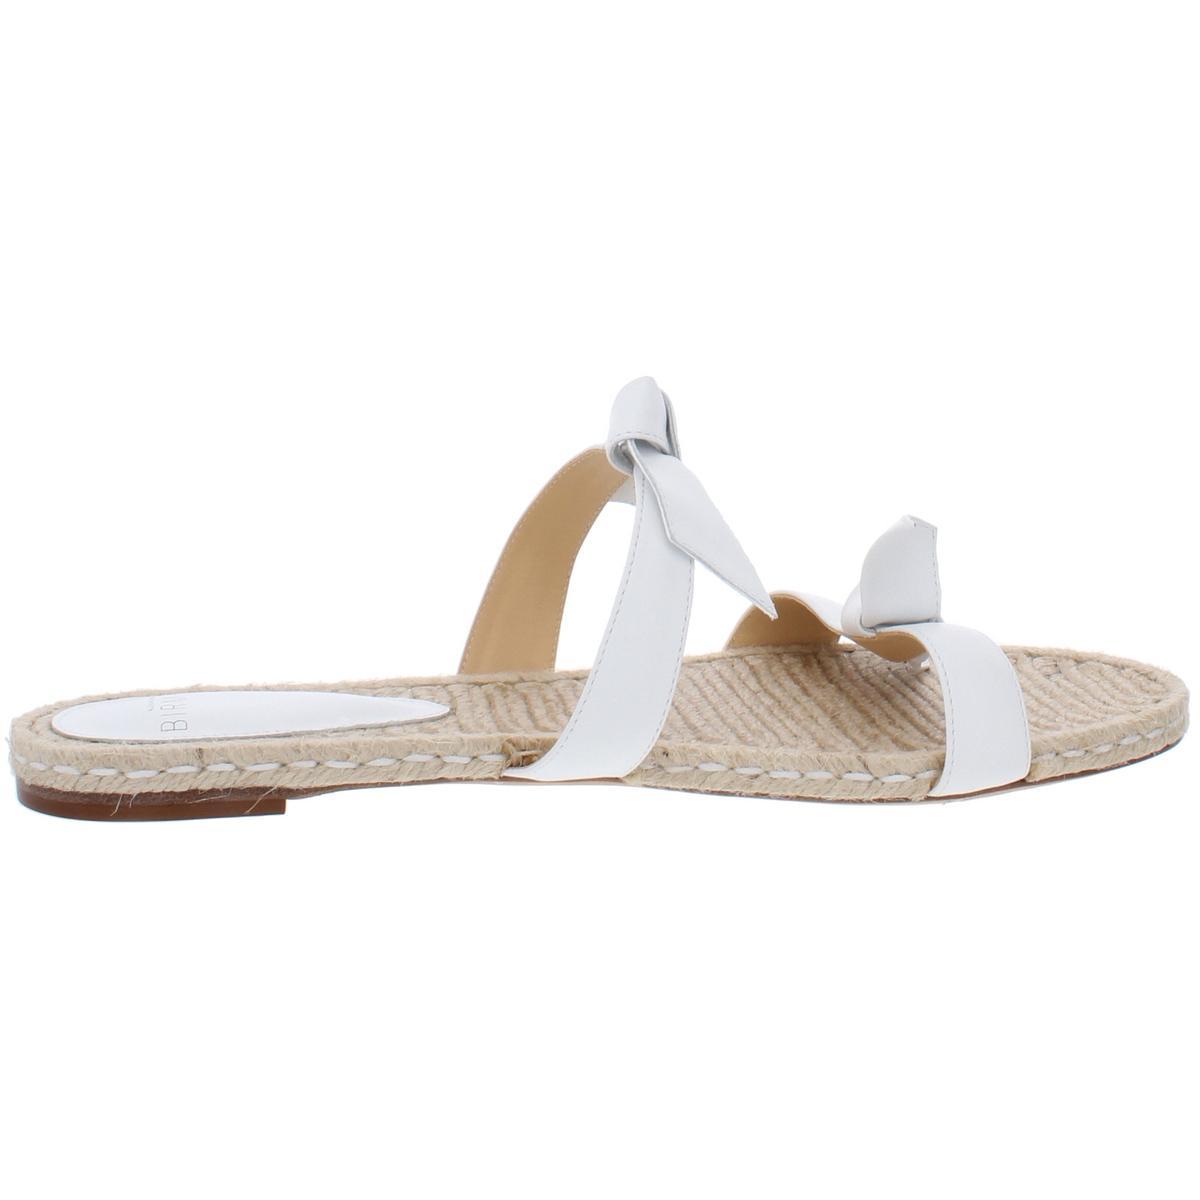 thumbnail 11 - Alexandre Birman Womens Clarita Leather Flats Slide Sandals Shoes BHFO 6244